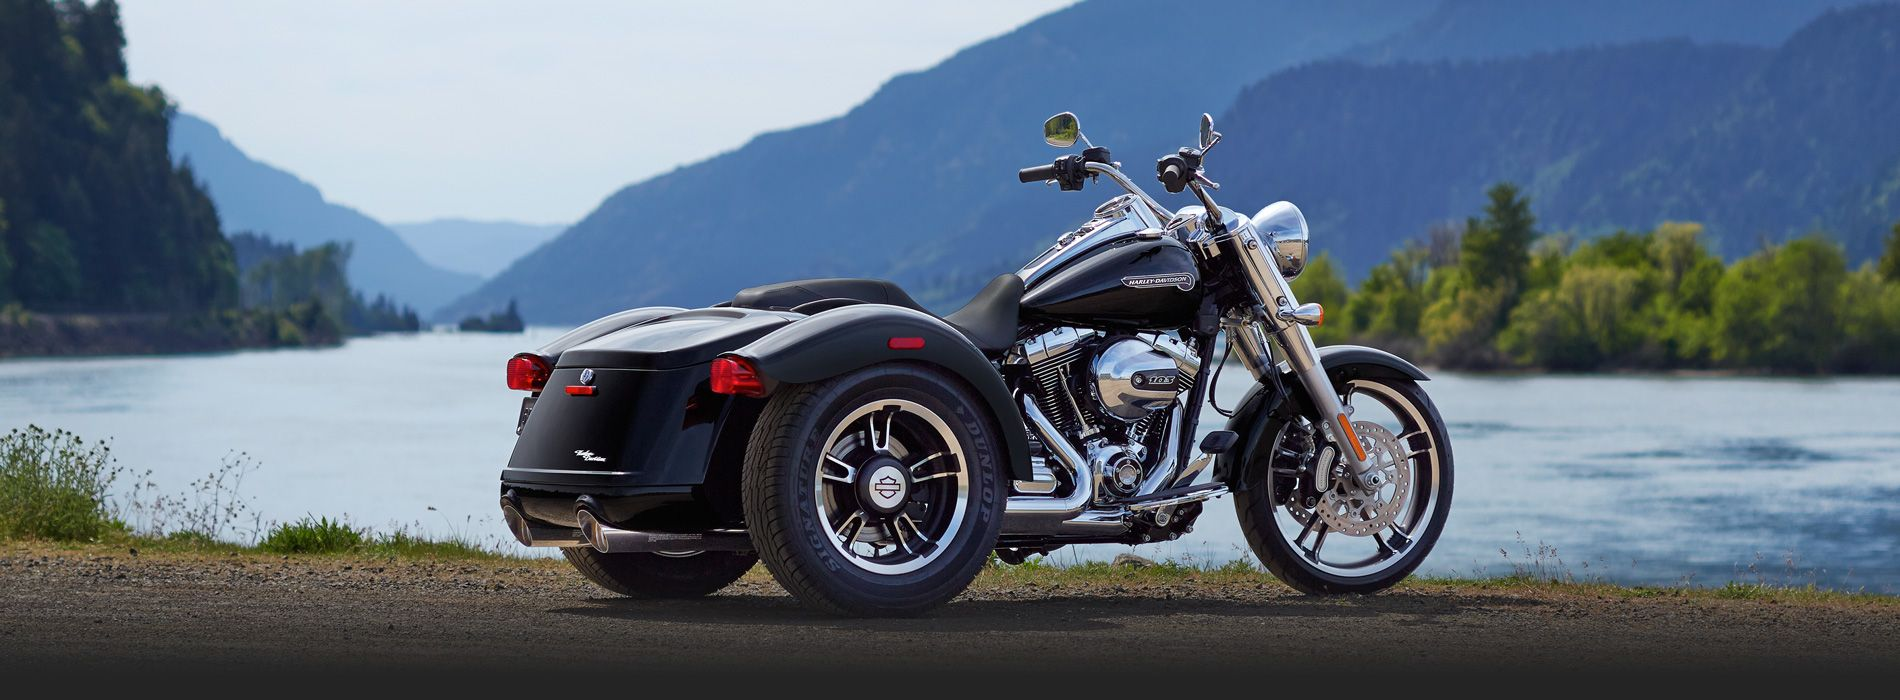 Harley Davidson Freewheeler Black Three Wheels For Easy Handling 2014 Sportster Wiring Diagram Plenty Of Trunk Space Getting Out Town A Few Nights